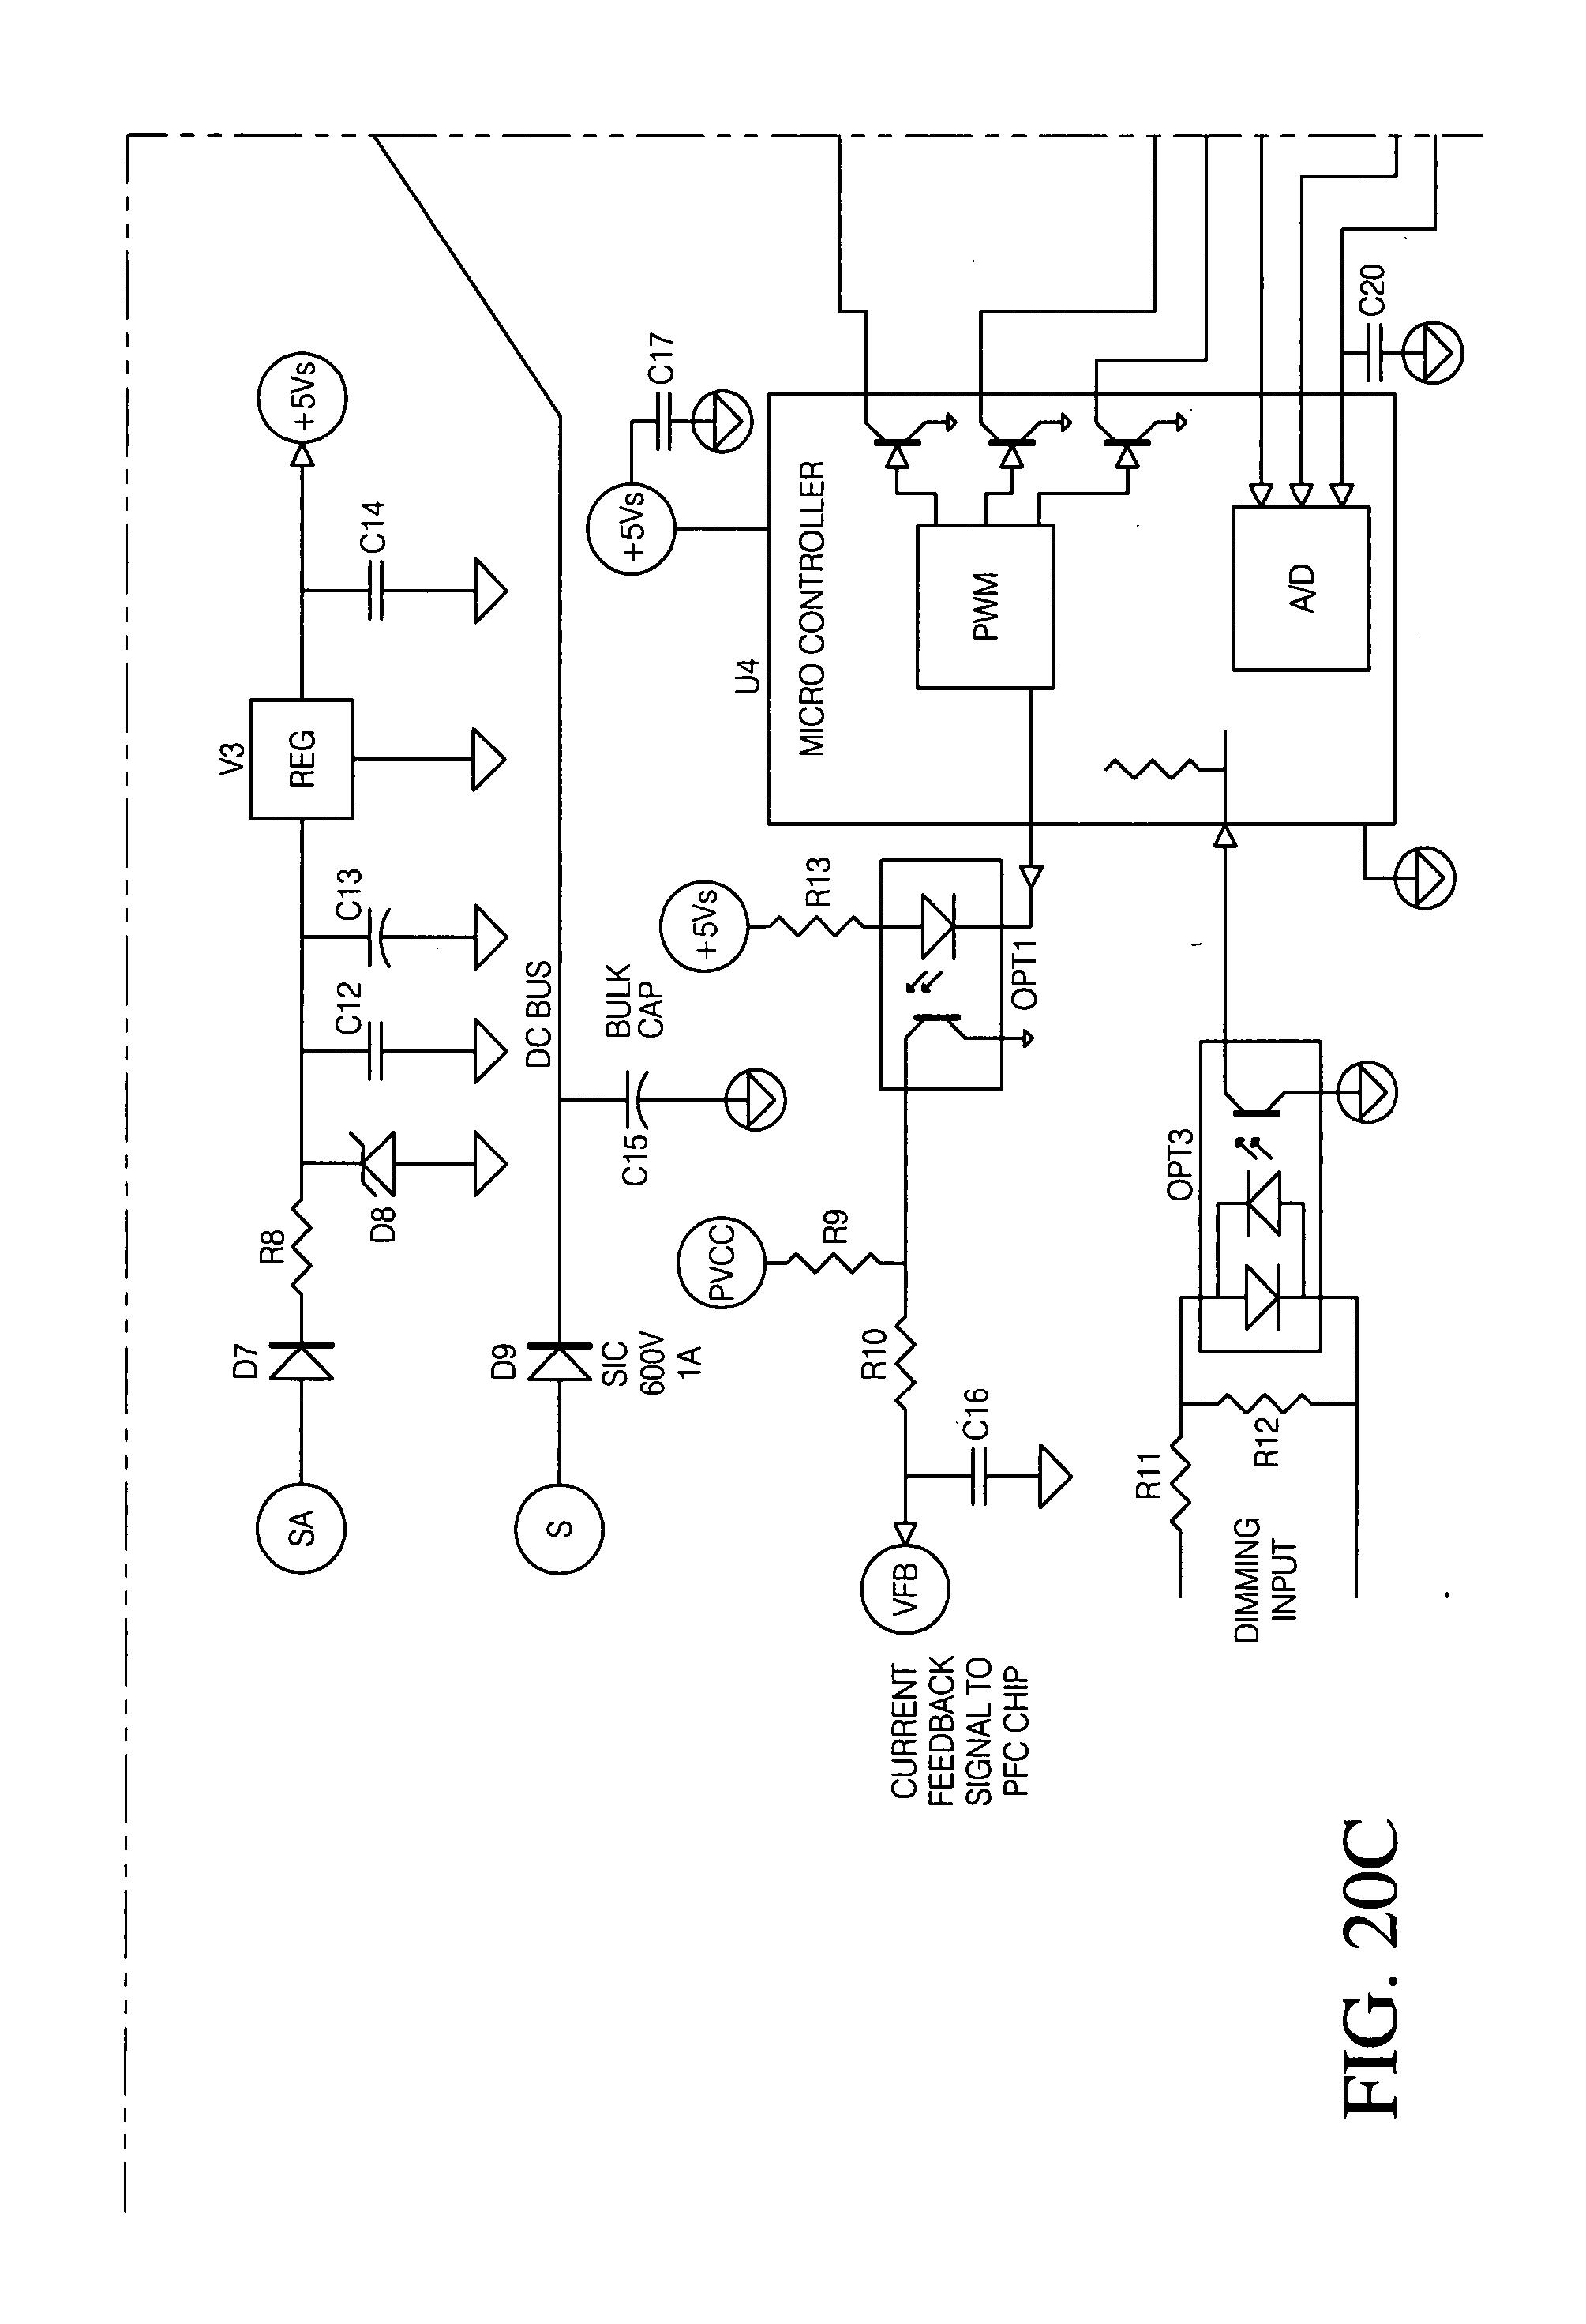 Emergency Lighting Inverter Wiring Diagram Crestron : 51